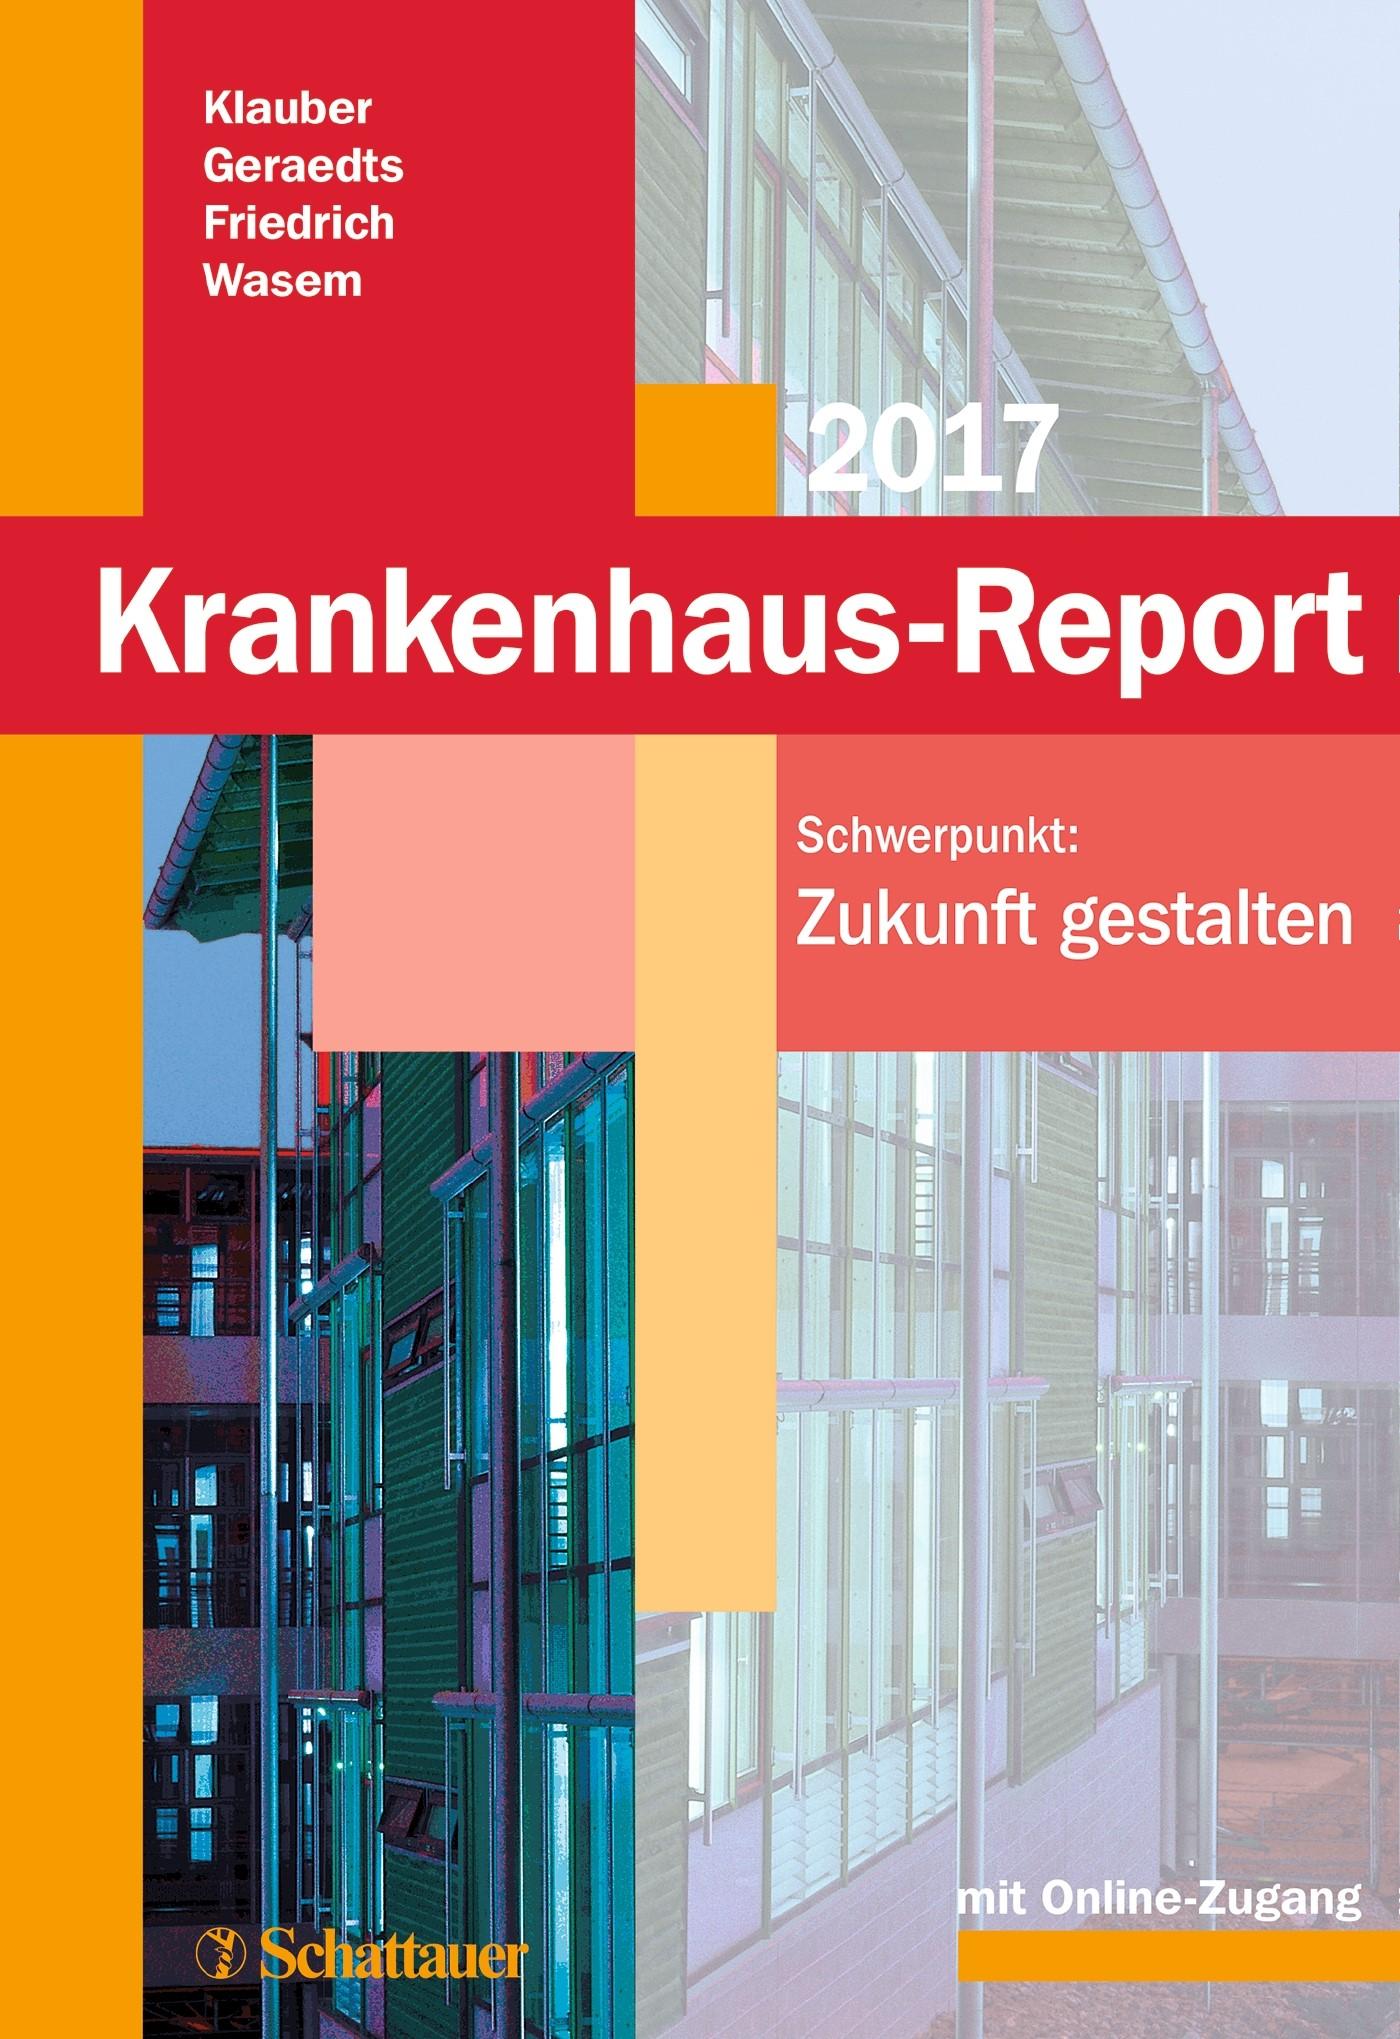 Krankenhaus-Report 2017 | Klauber / Geraedts / Friedrich / Wasem, 2017 (Cover)